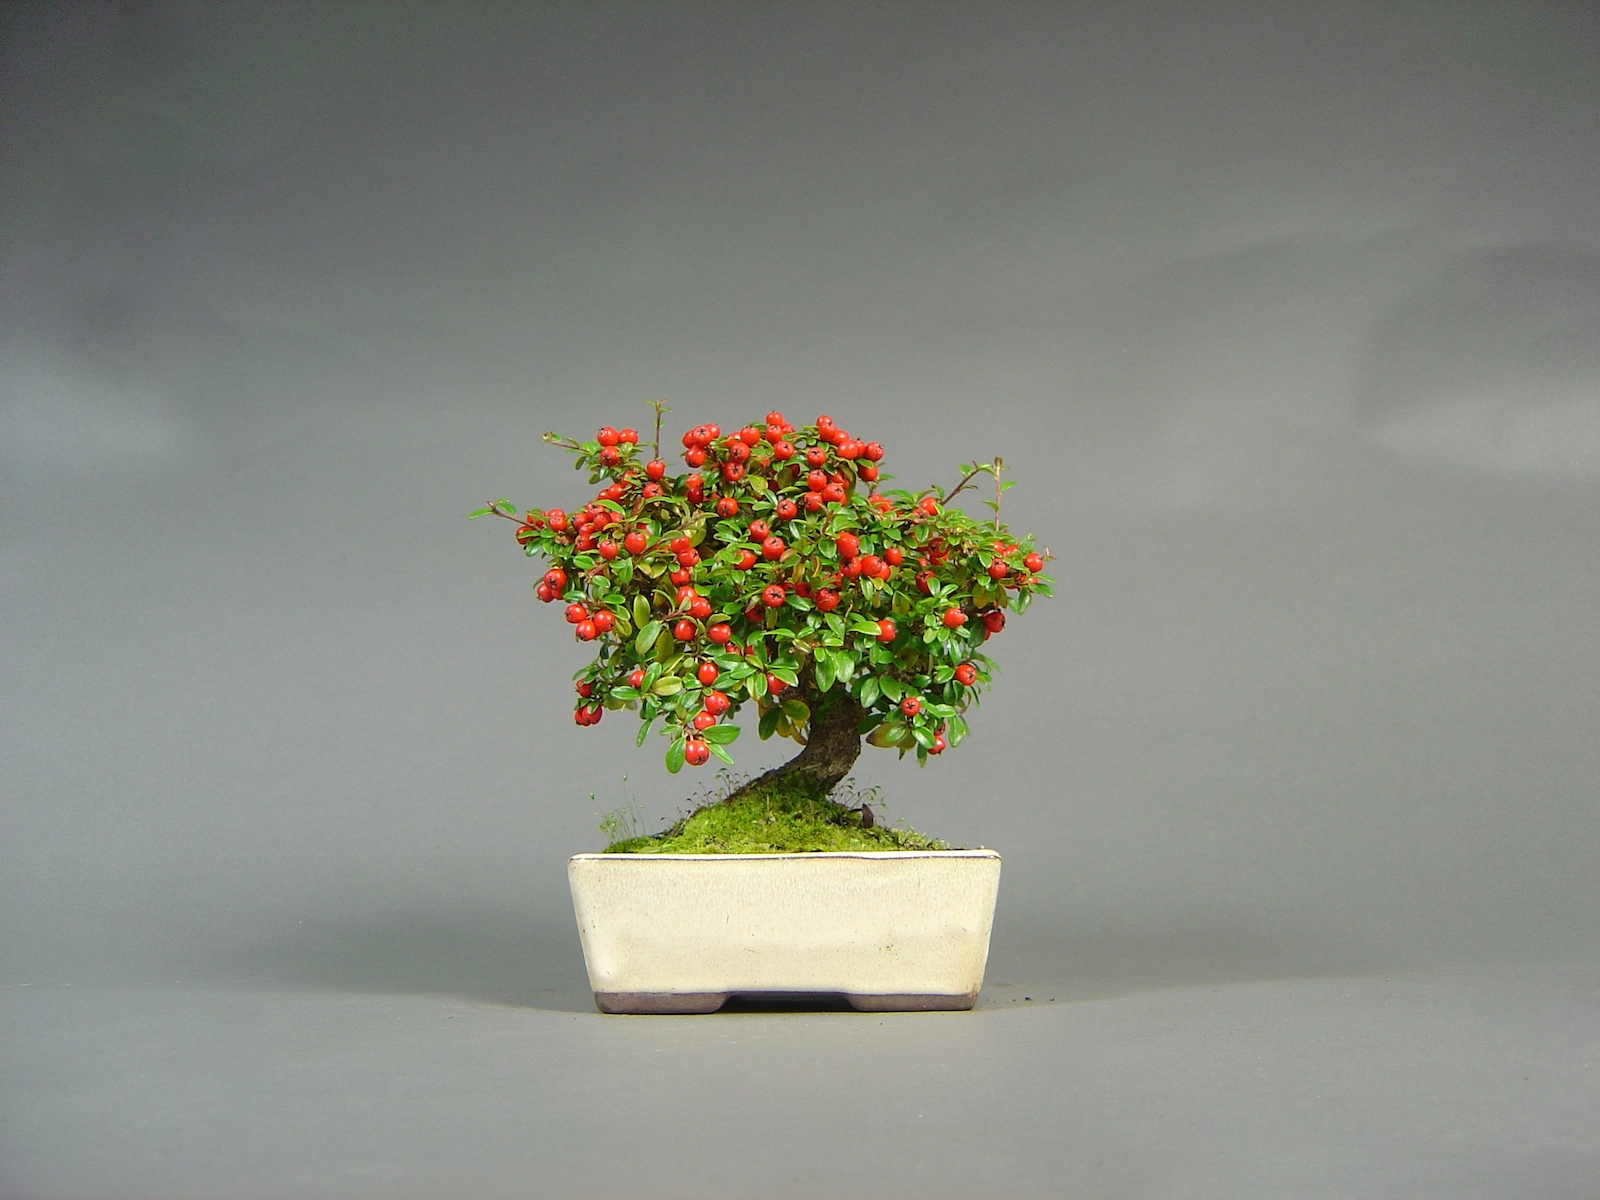 Zwergmispel, Cotoneaster